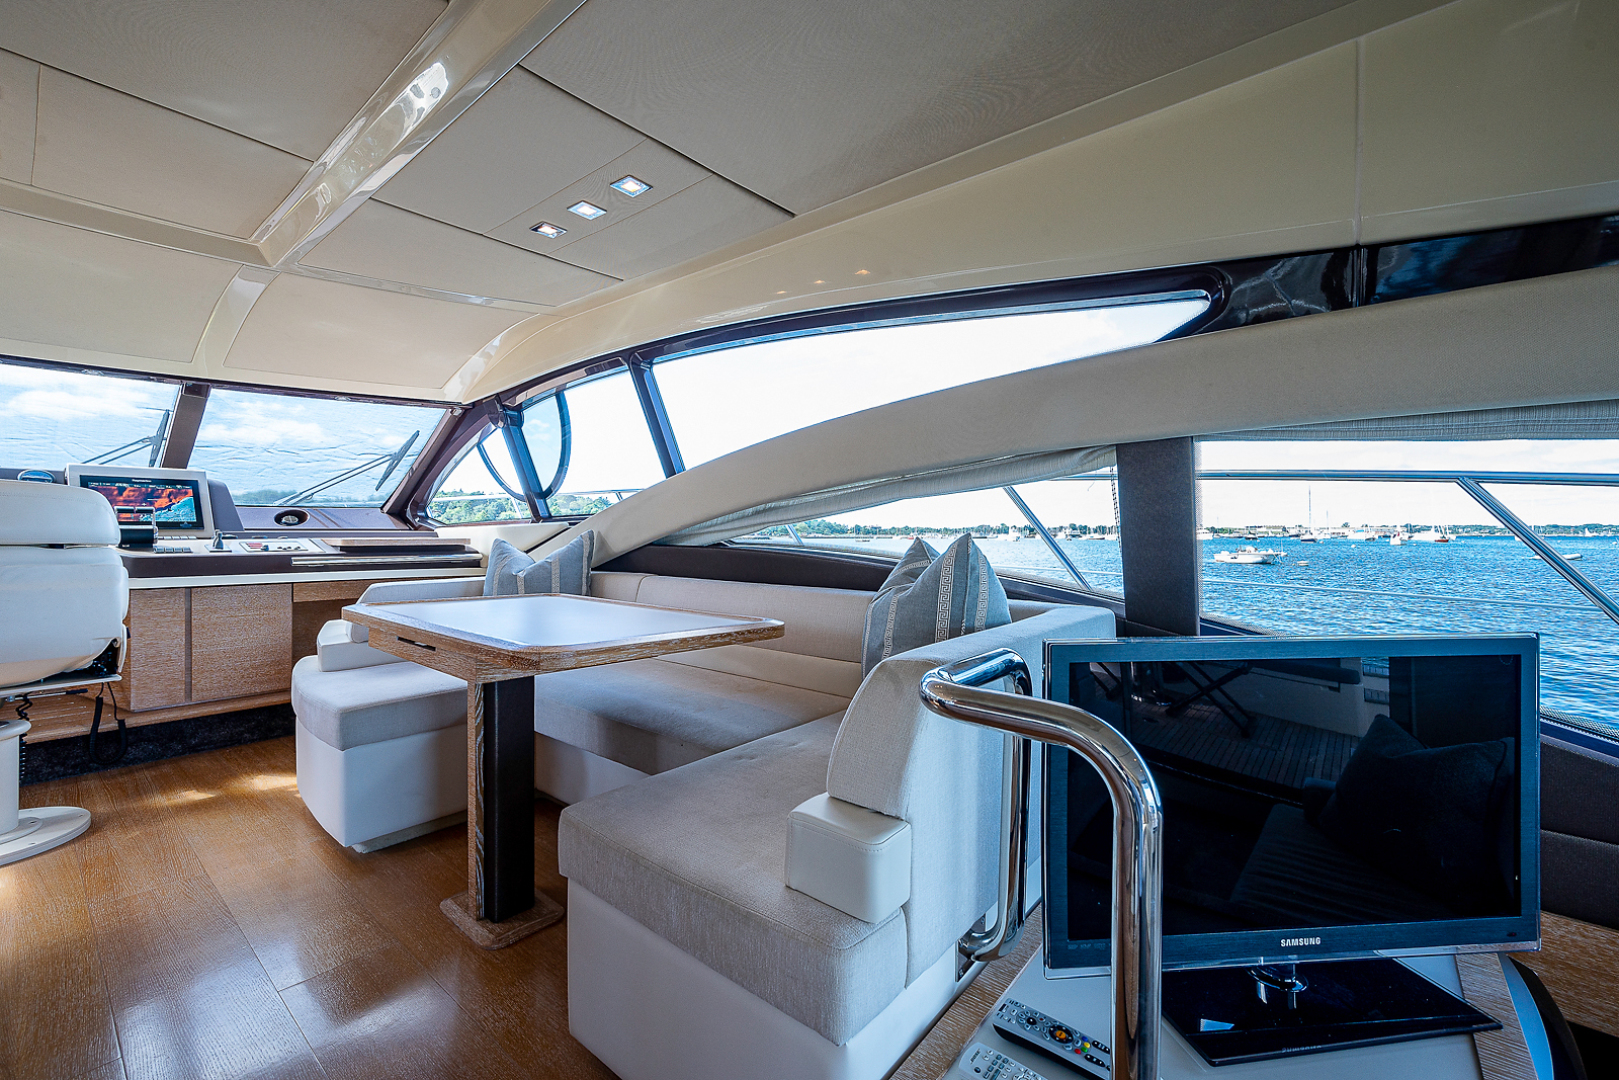 Azimut-58 Fly Motor Yacht 2011-Nova Fort Lauderdale-Florida-United States-58_azimut_nova__dinette10-1490491 | Thumbnail